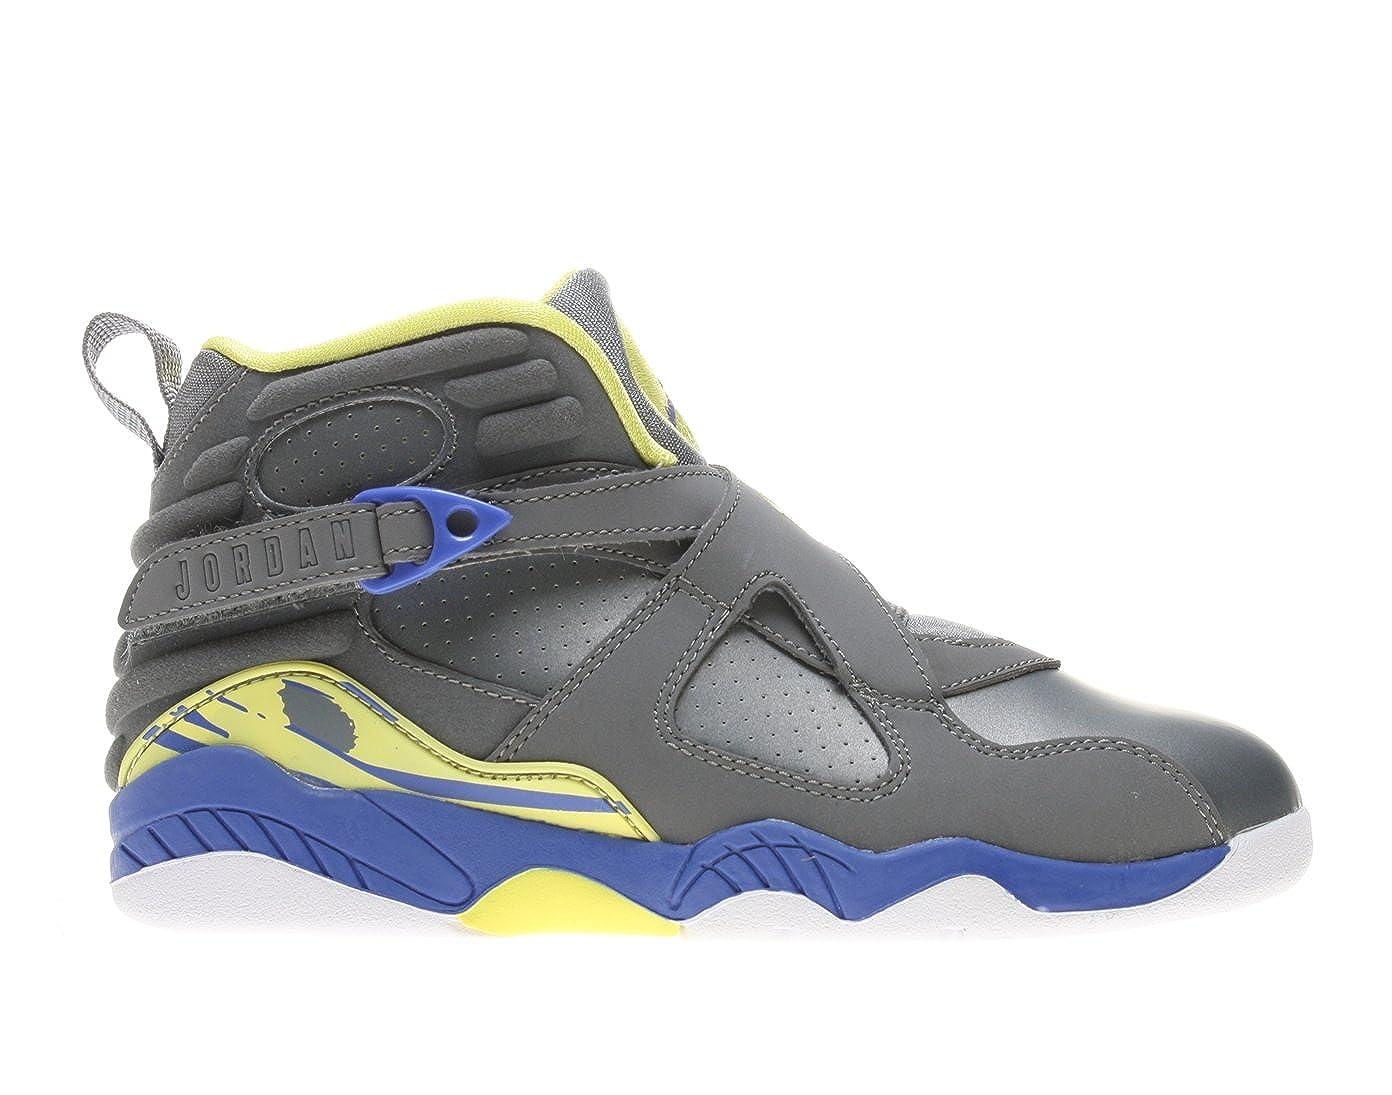 designer fashion 08556 e3863 Amazon.com   Jordan Girl s Air 8 Retro Laney - Cool Grey Violet  Force-Electric Yellow   Basketball